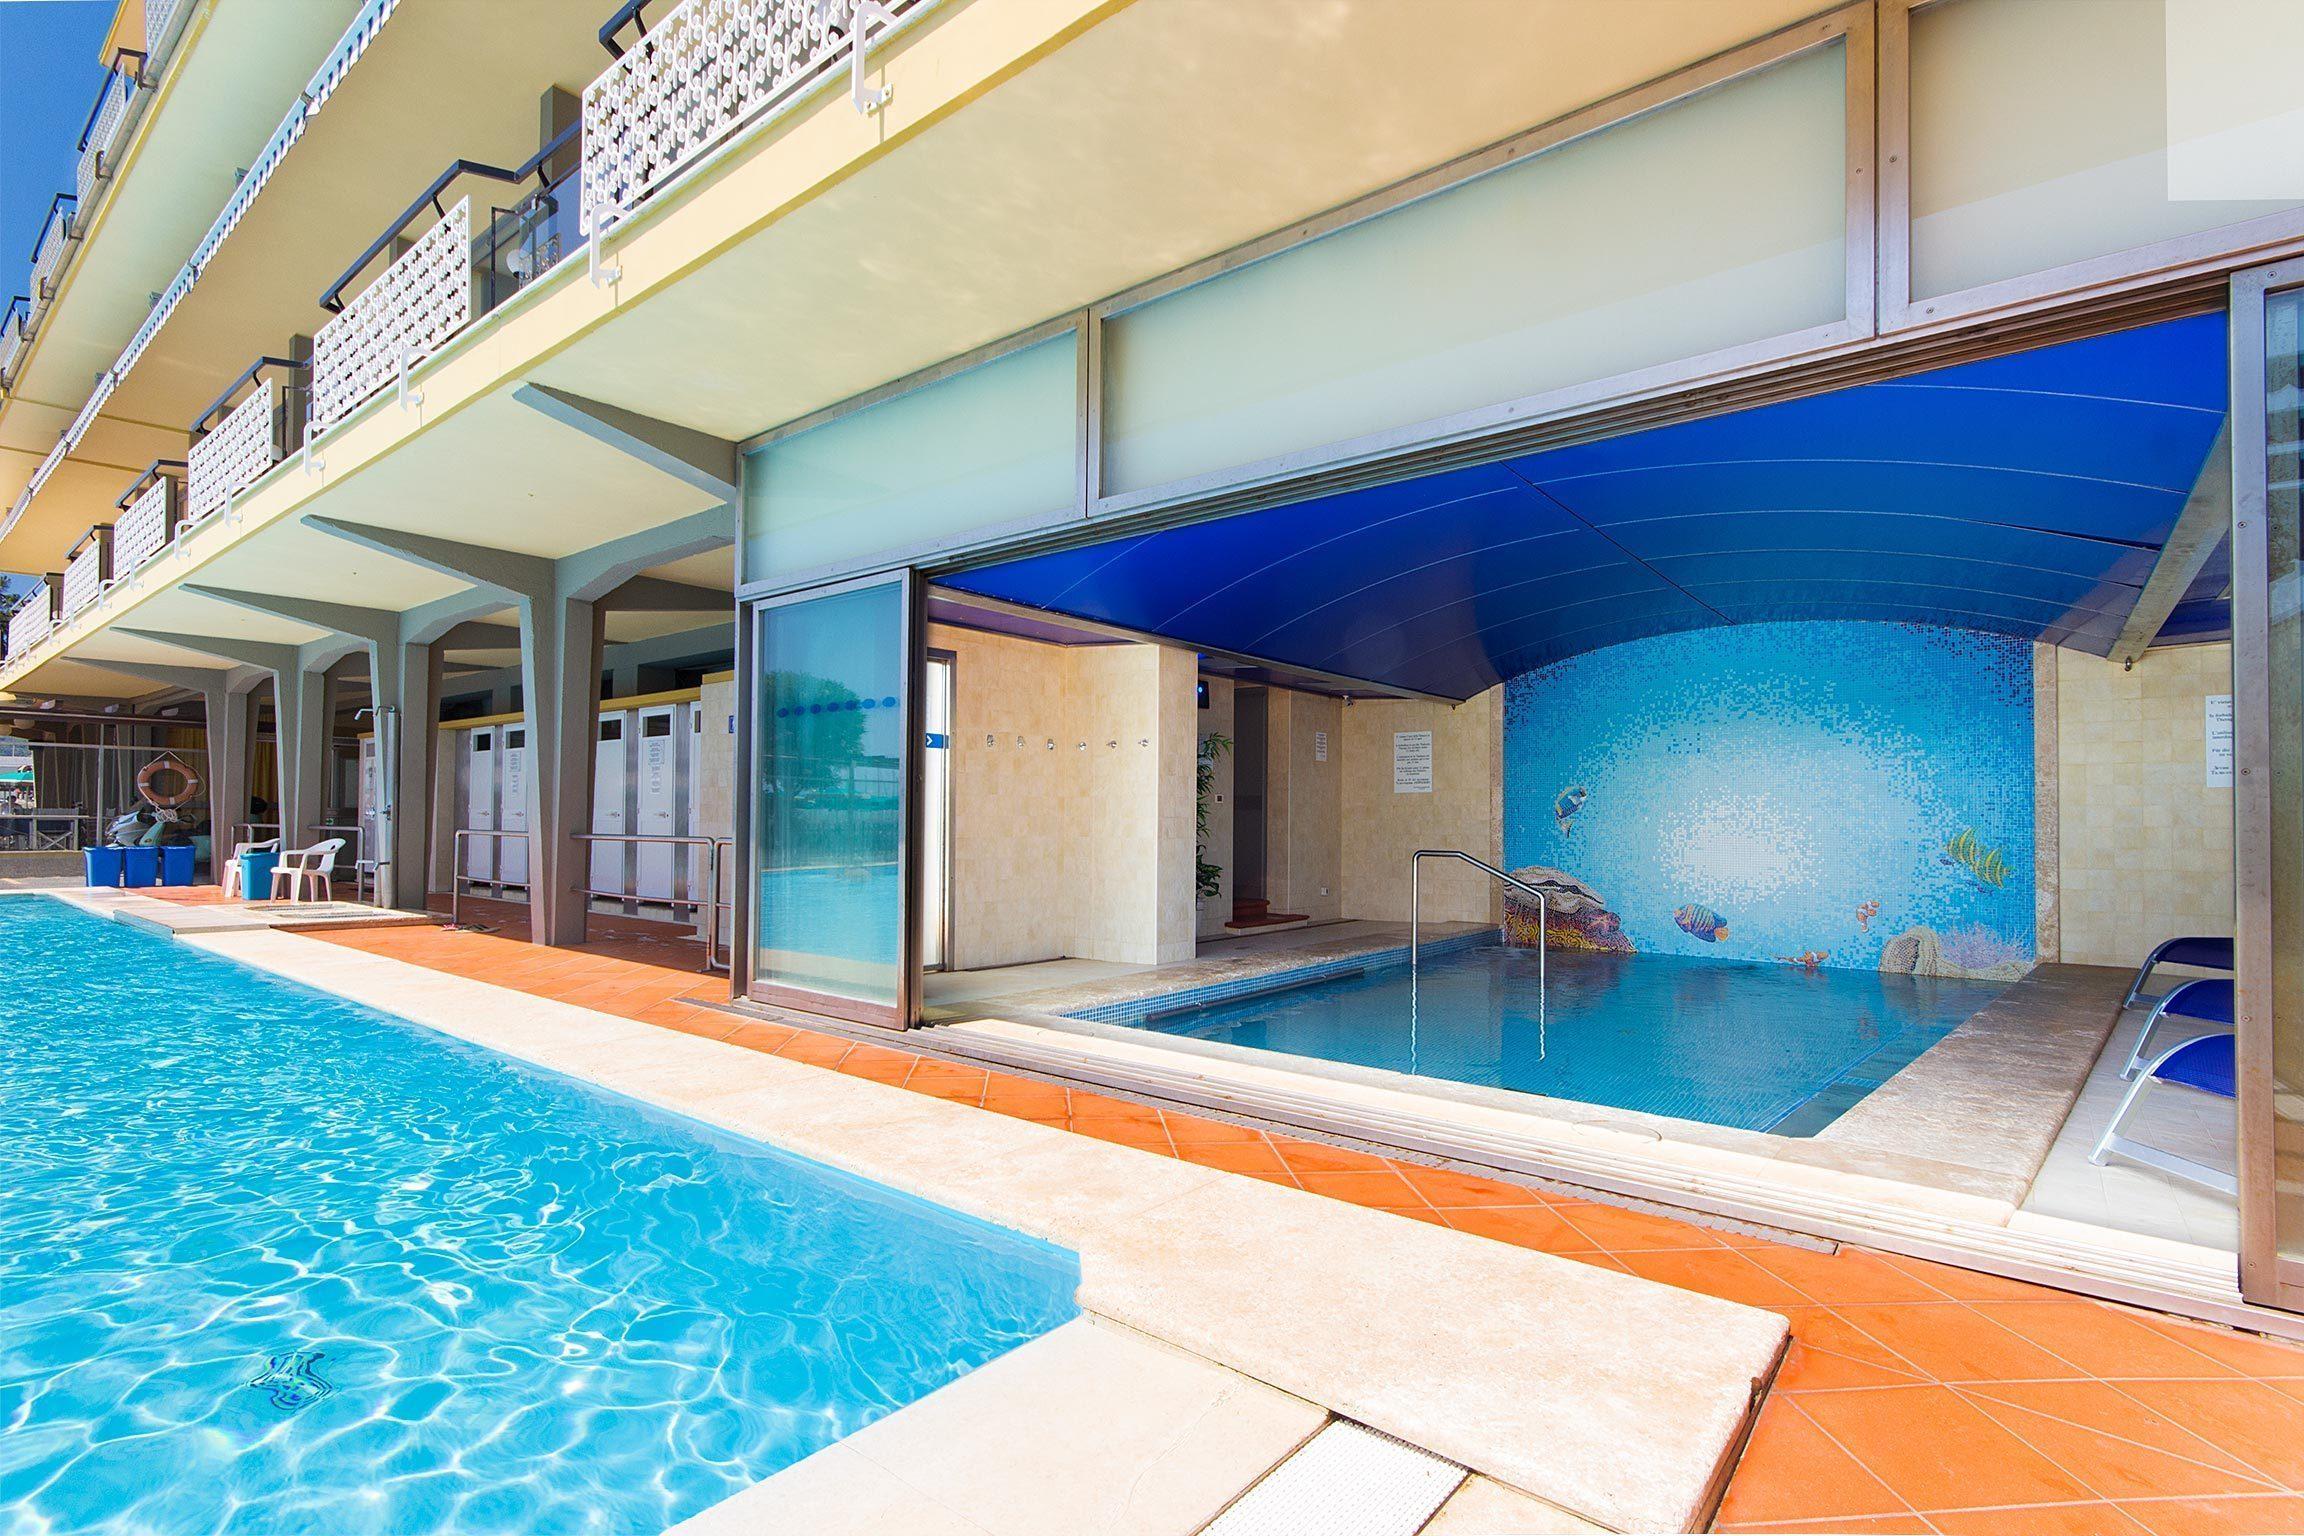 hotel con piscina a diano marina - le due piscine